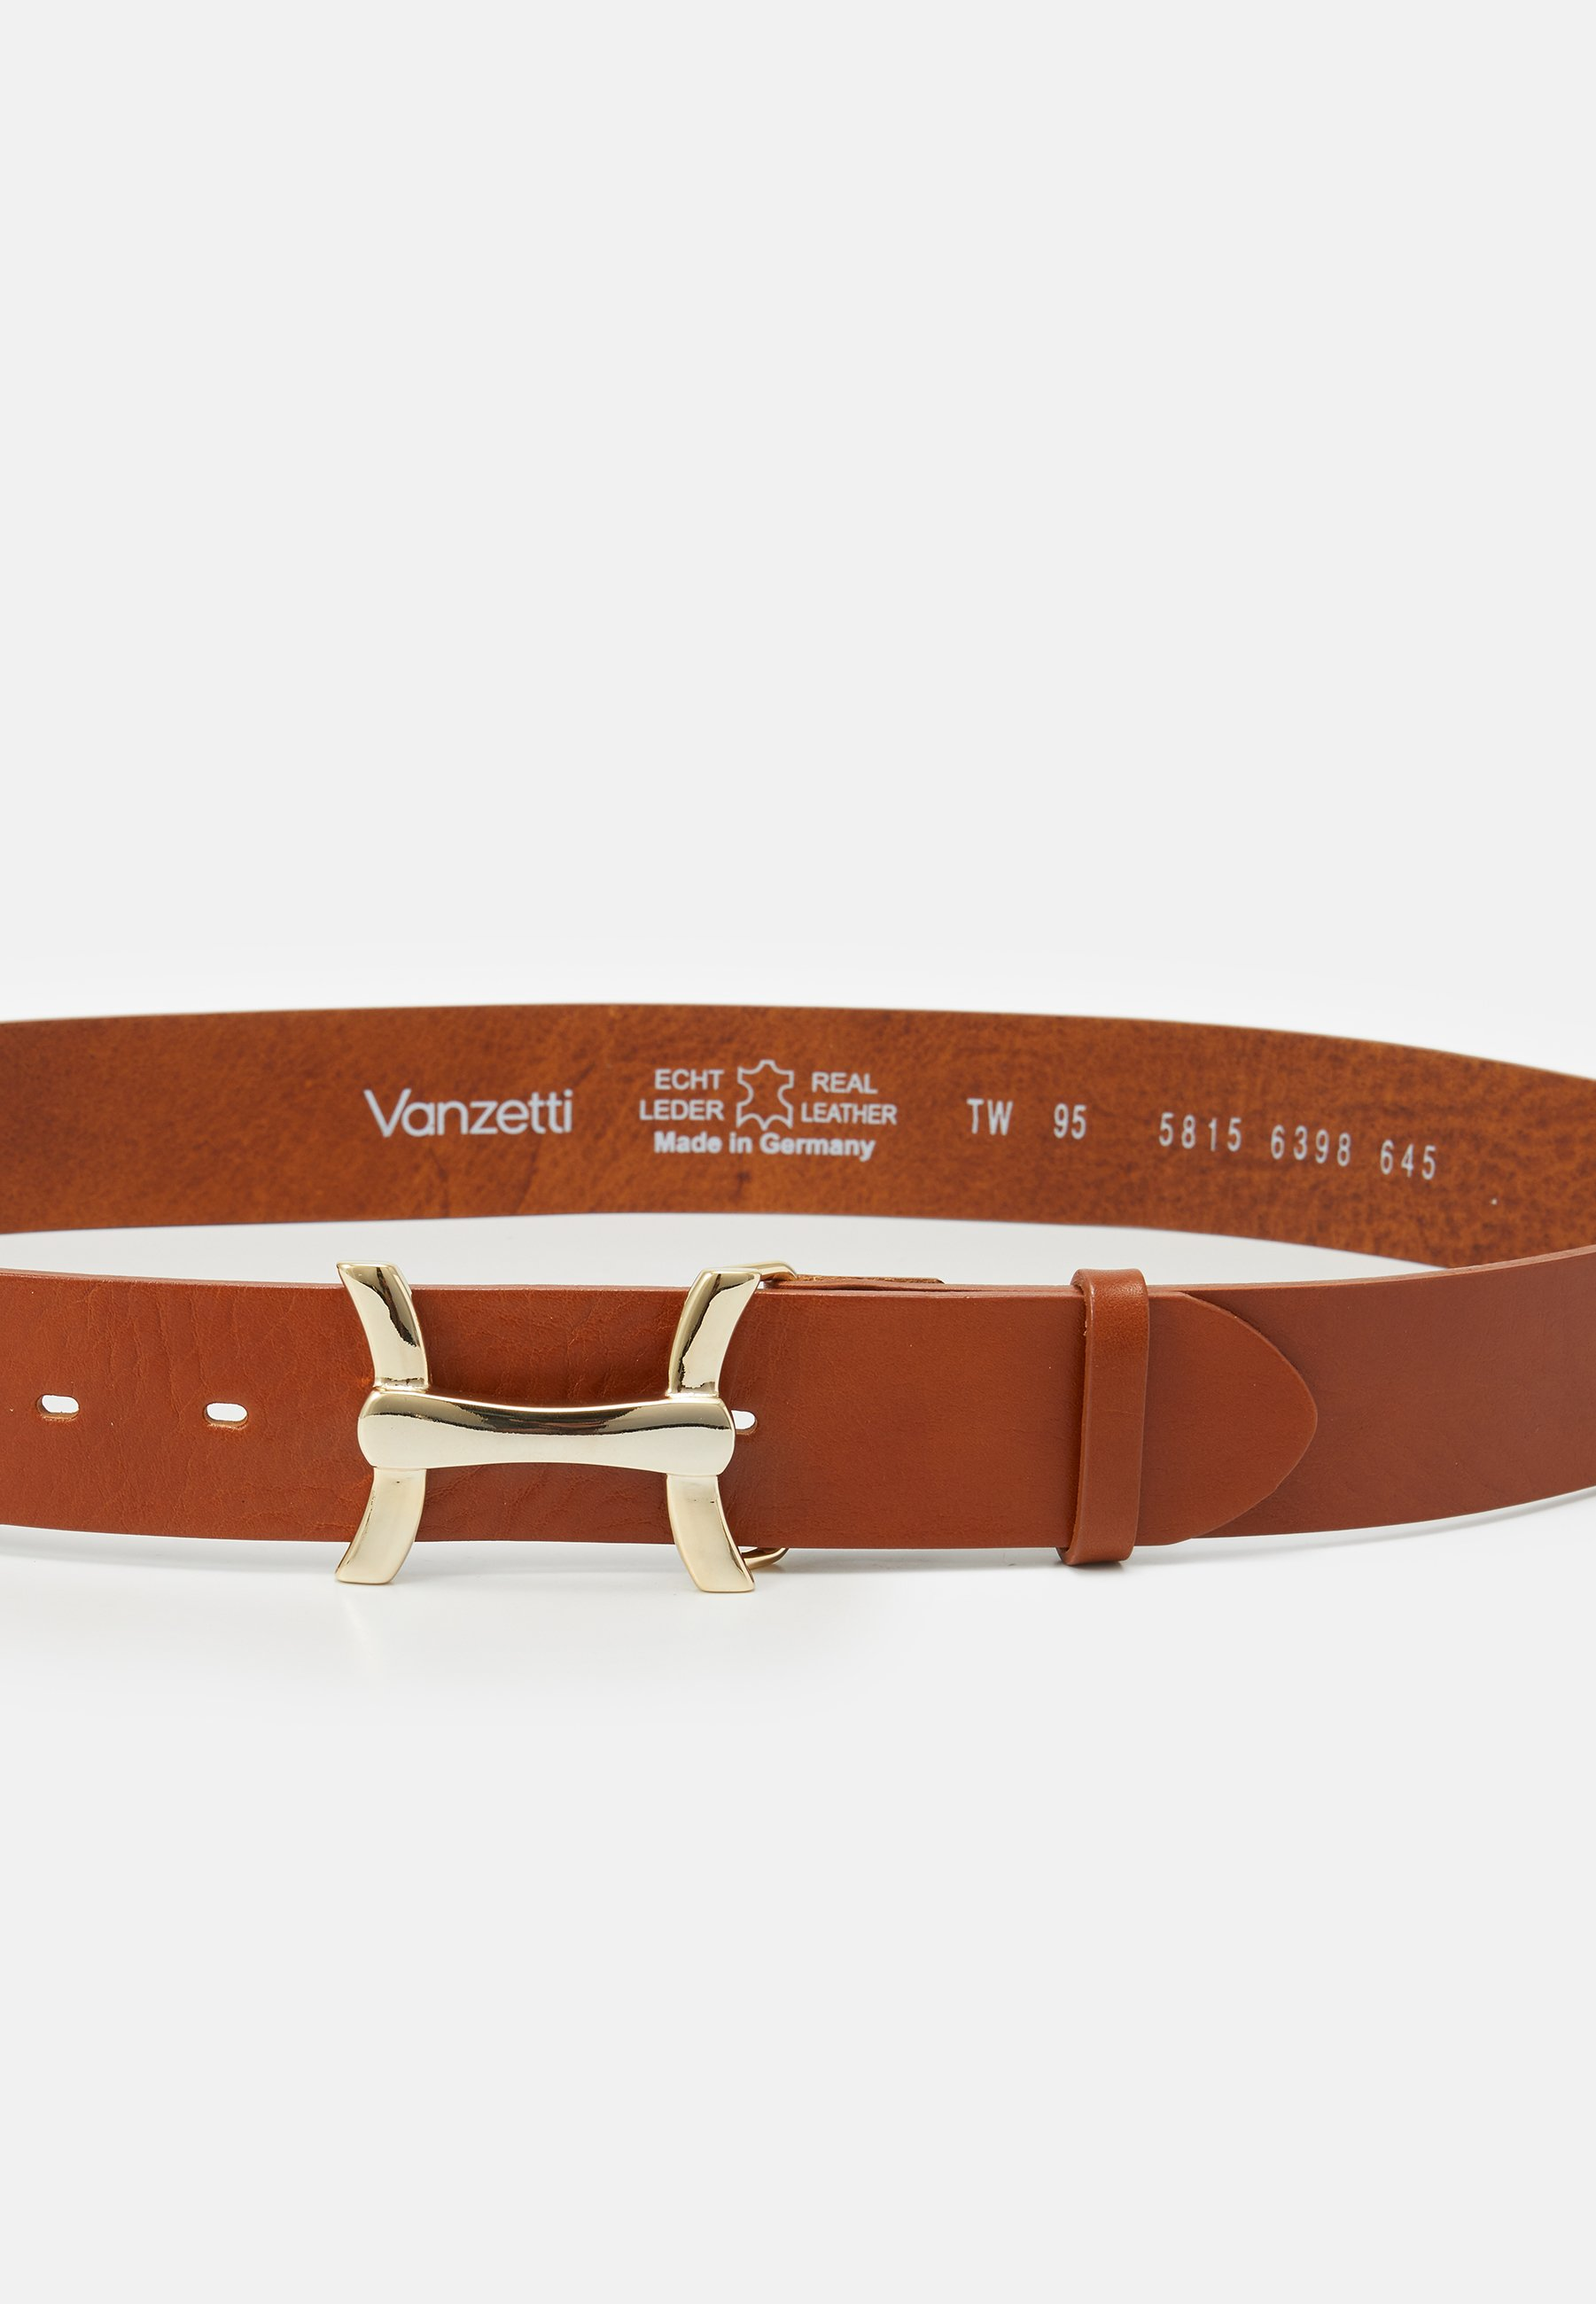 2020 New Affordable Accessories Vanzetti Belt cognac aLNdRaVA2 vnk8d1iuP